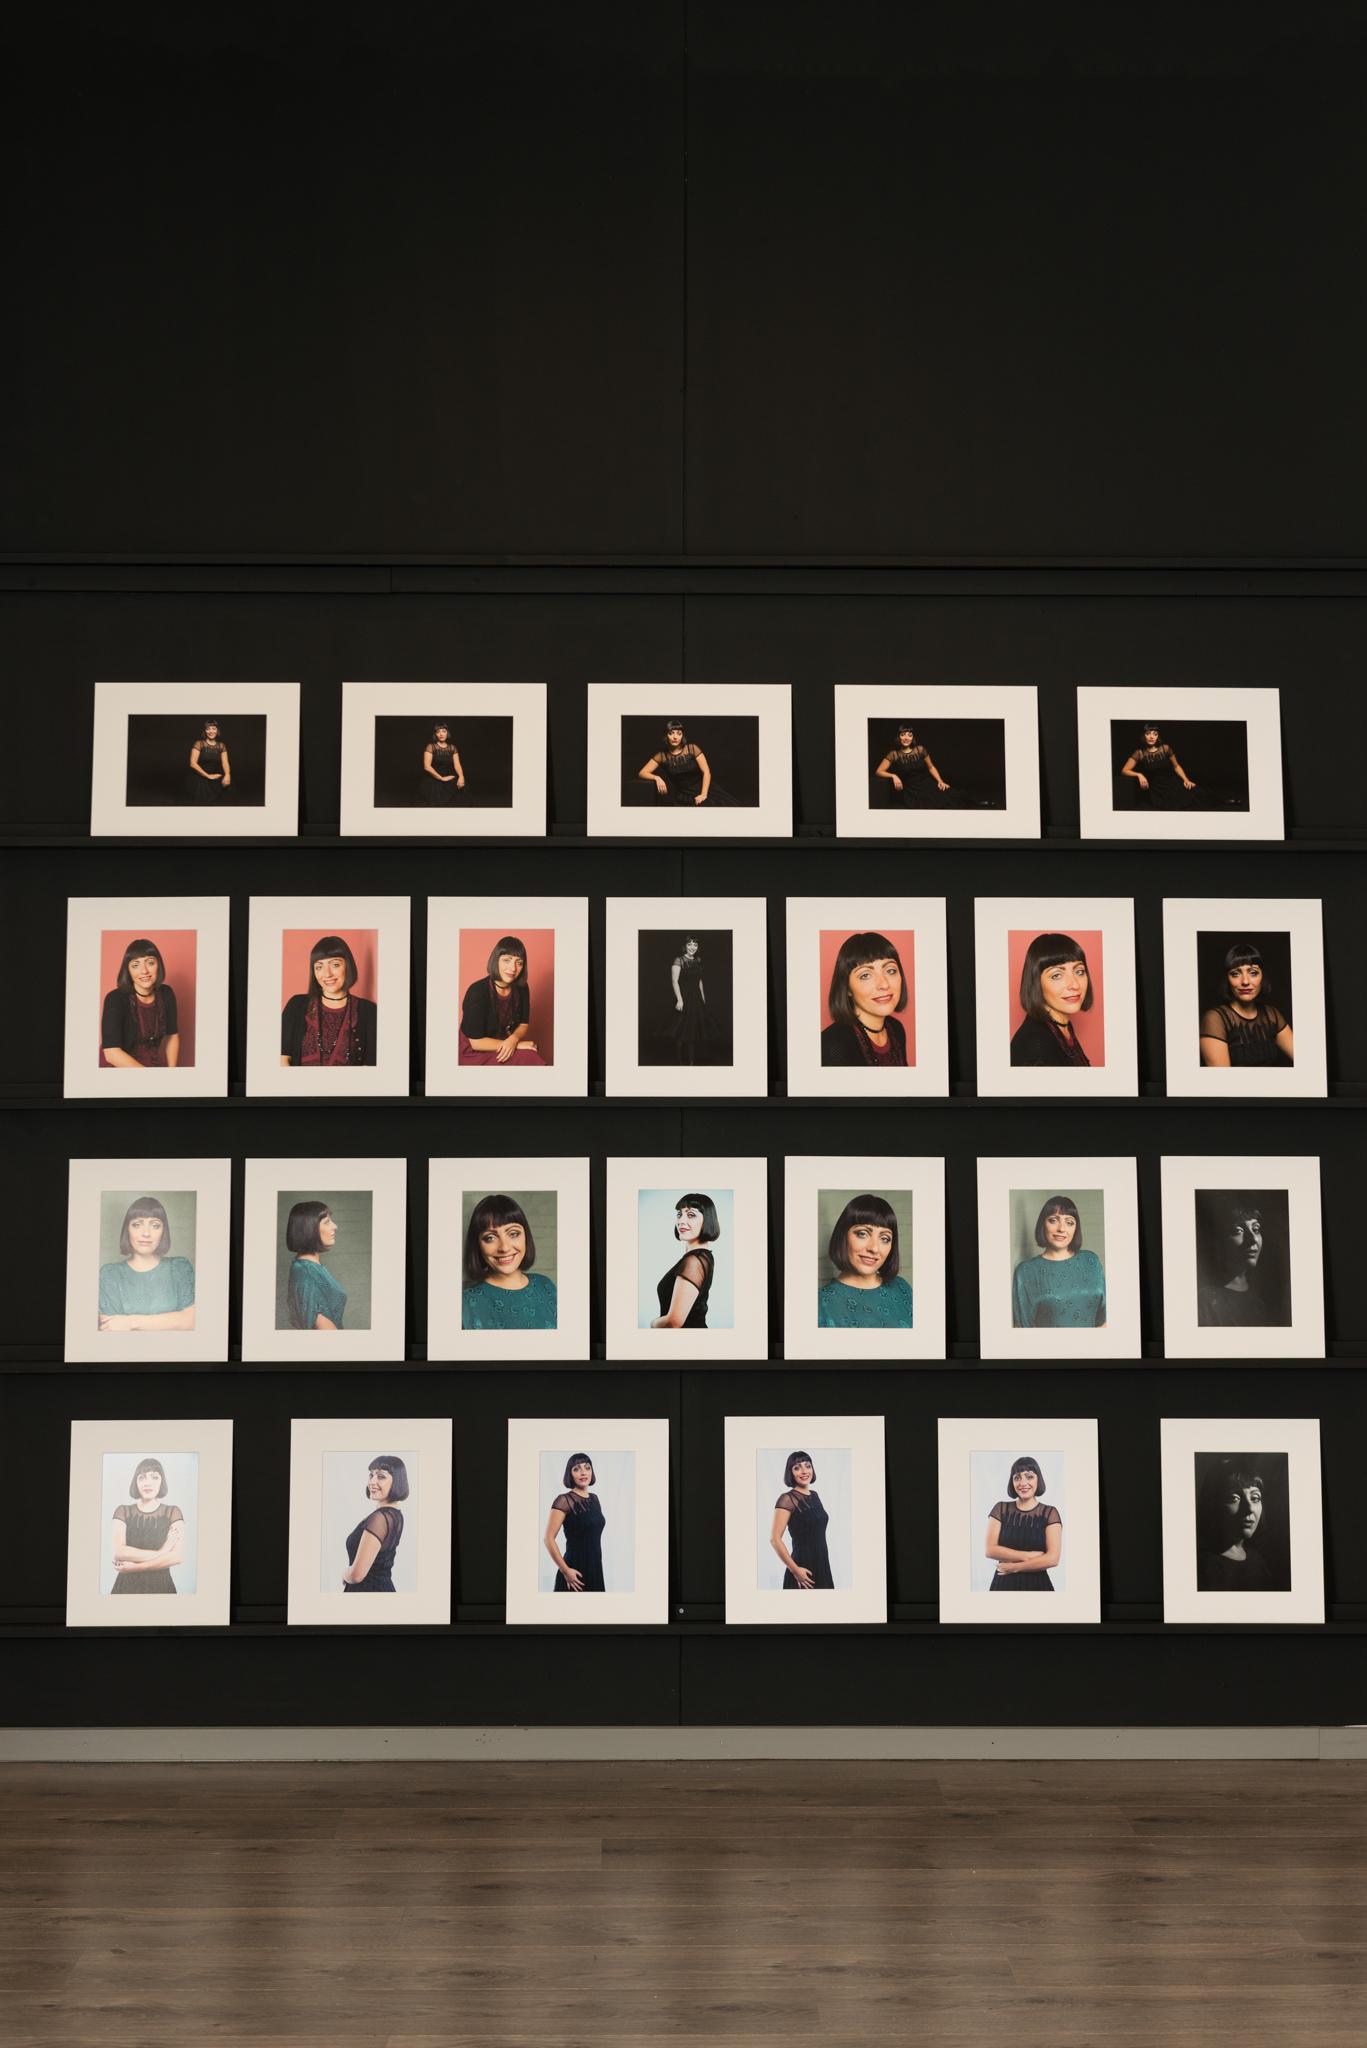 onthulling portretfoto's